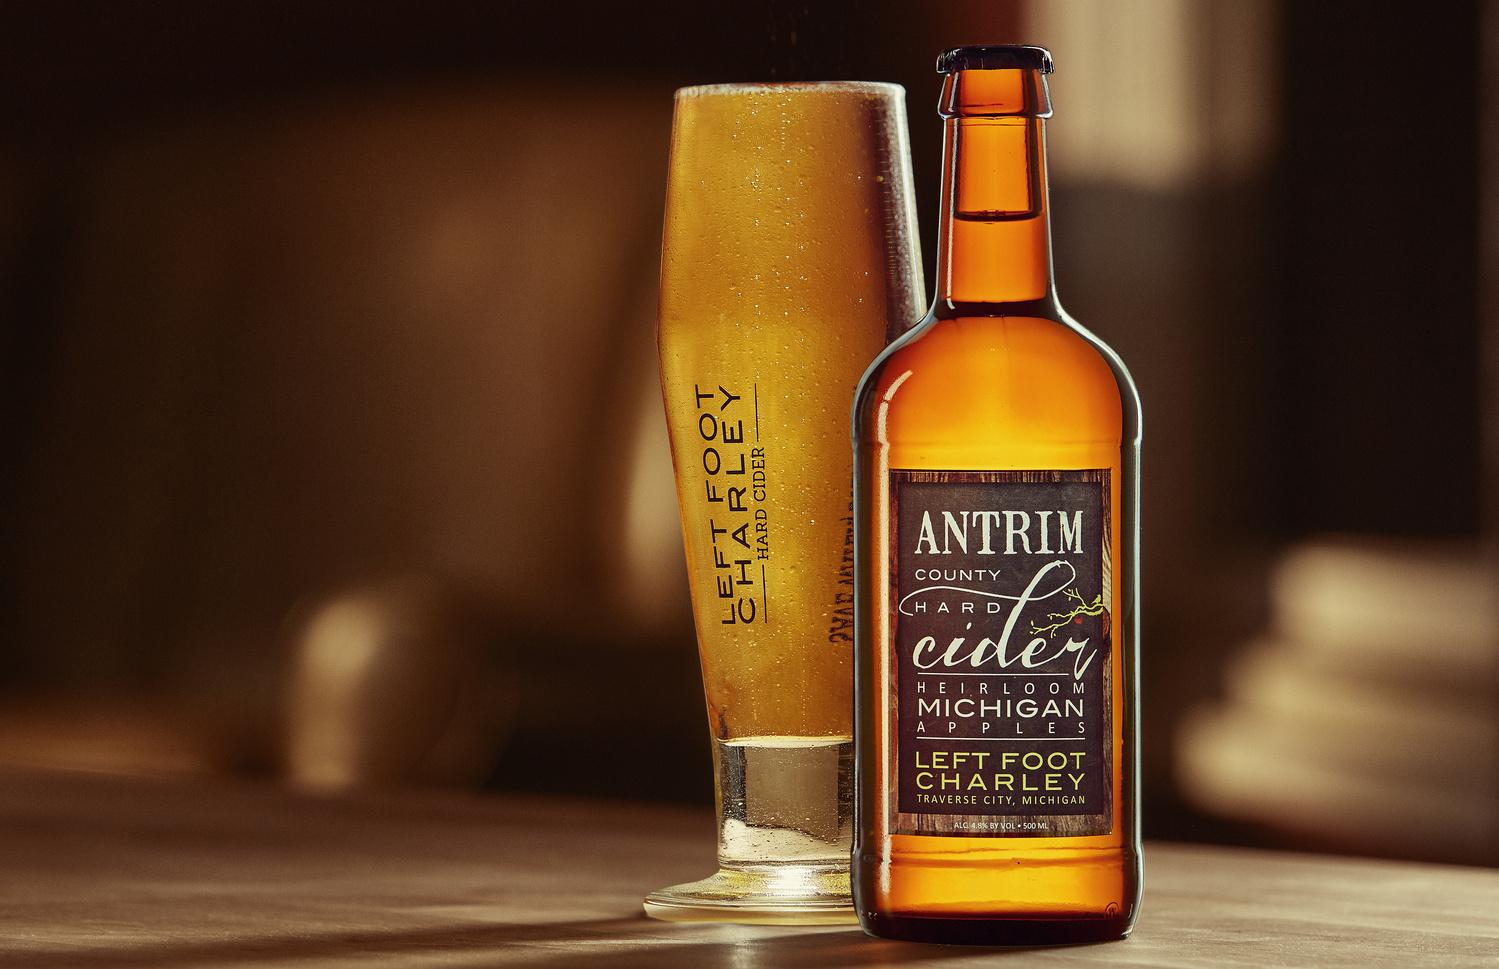 Antrim Hard Cider by Aaron McGrane